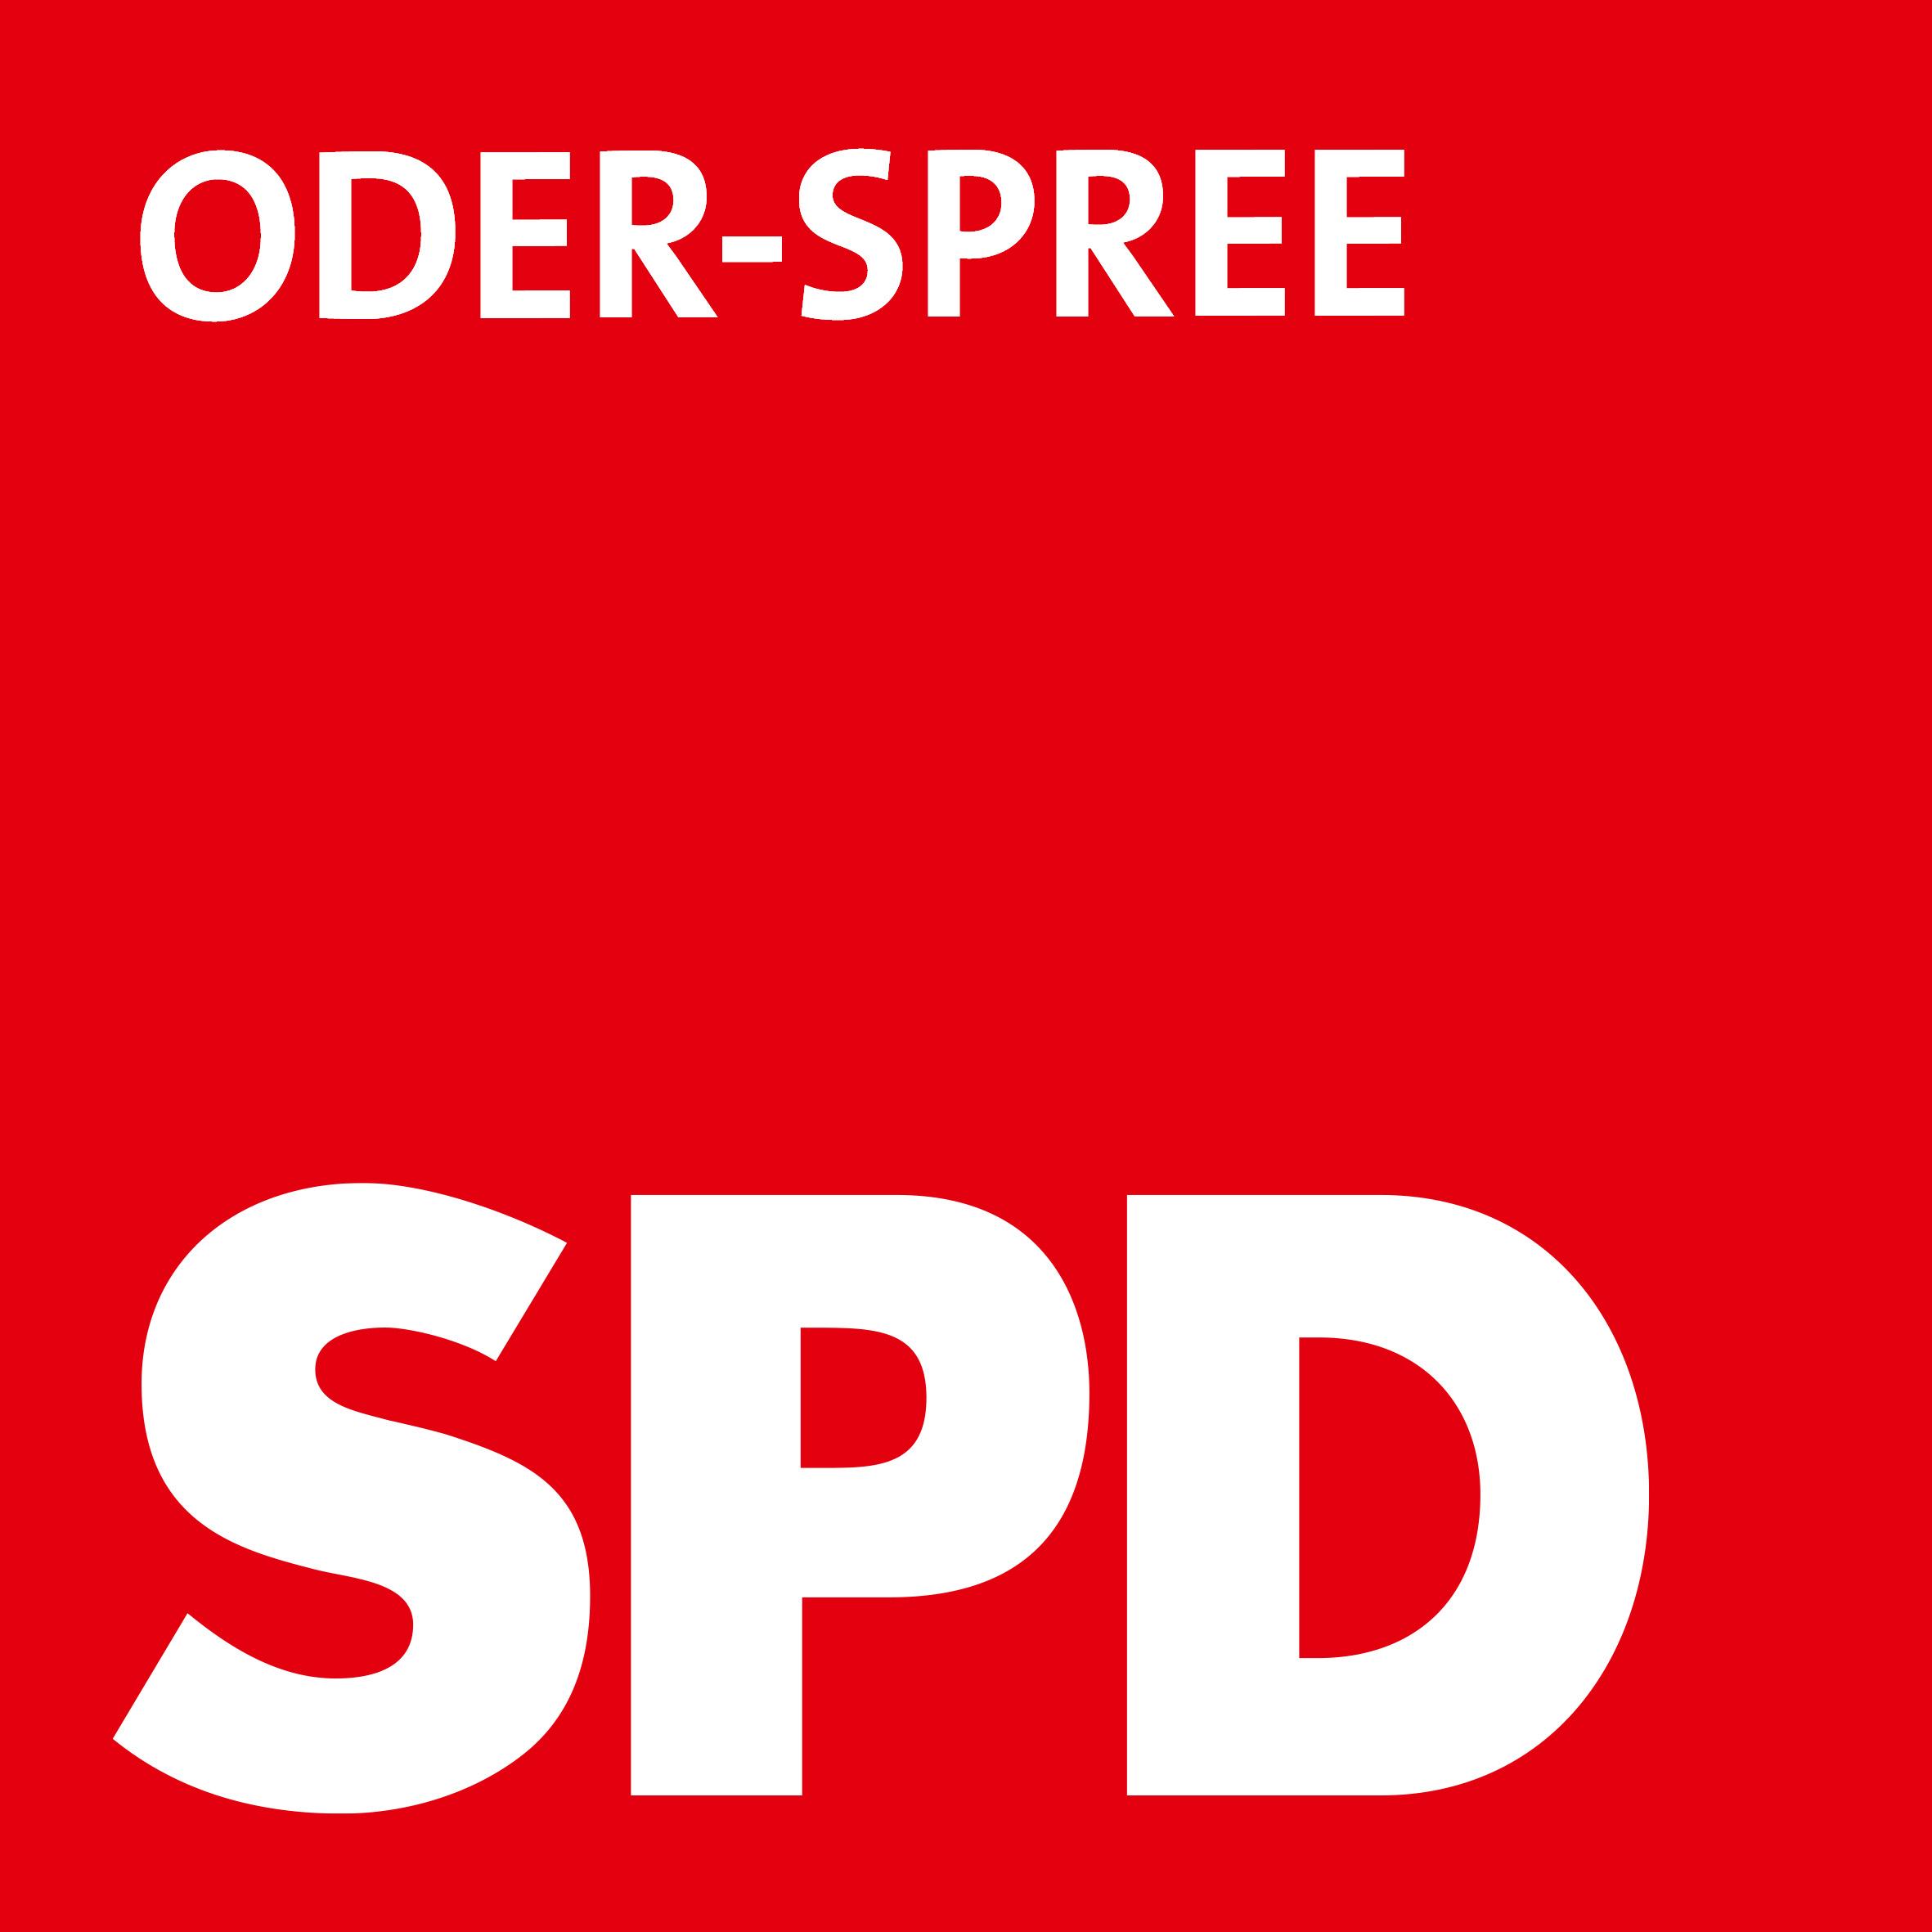 SPD Oder-Spree